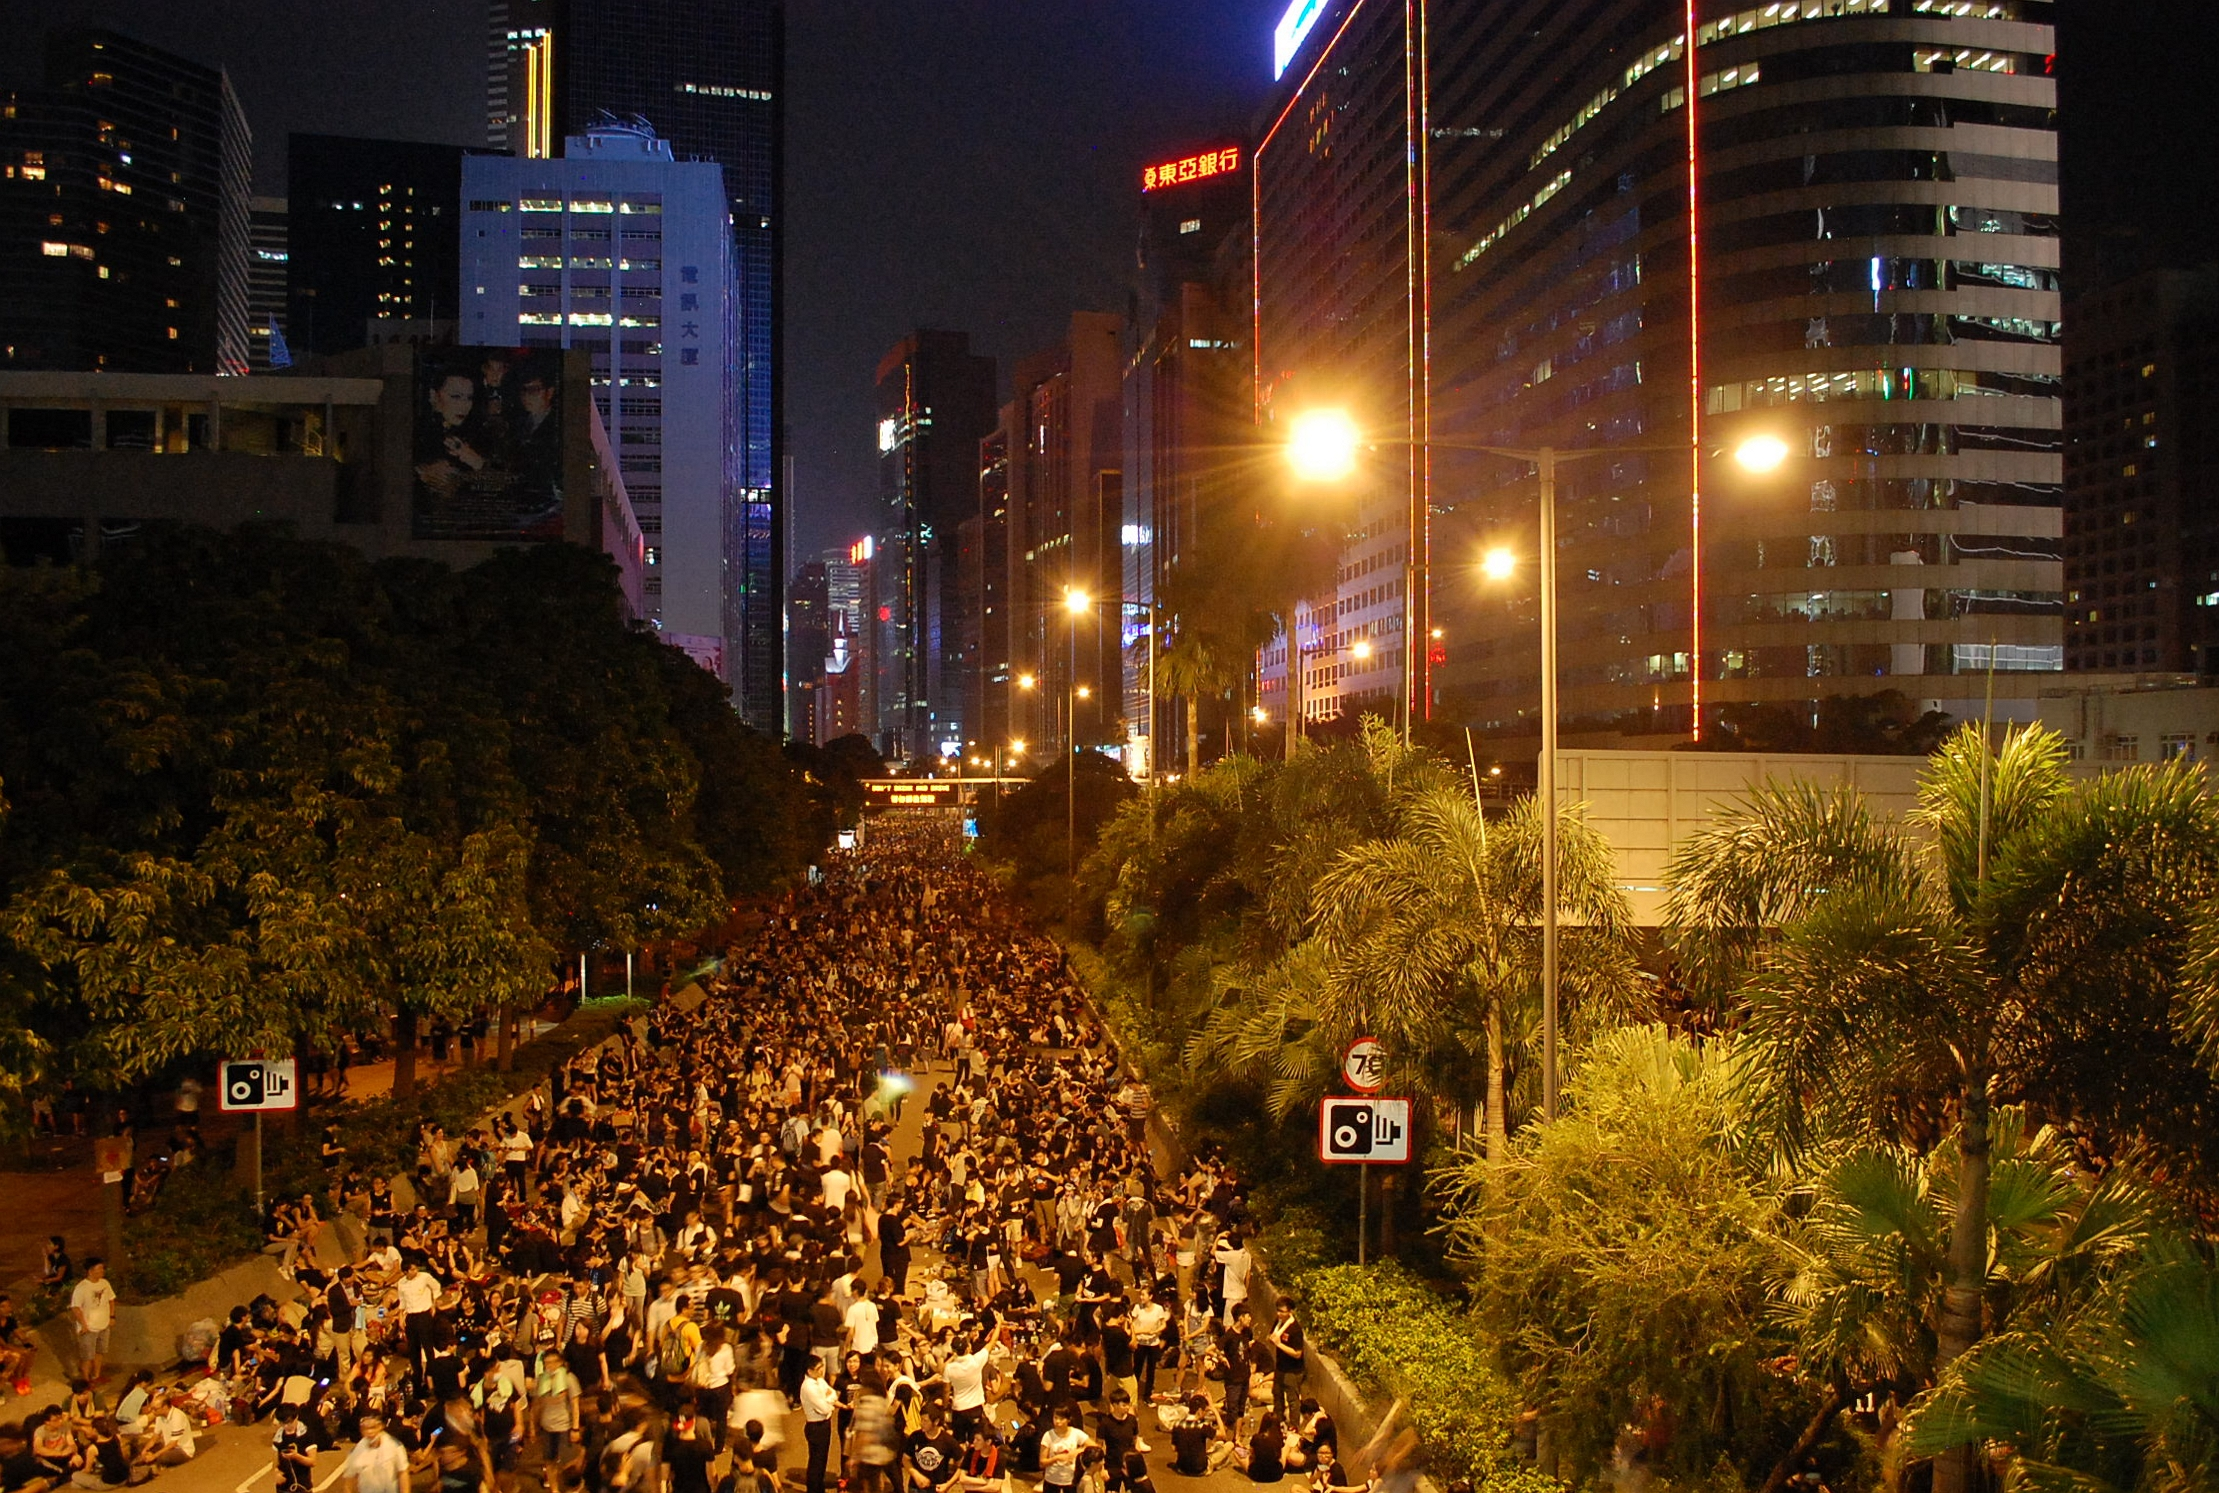 File:29.9.14 Hong Kong Protest Near Wan Chai